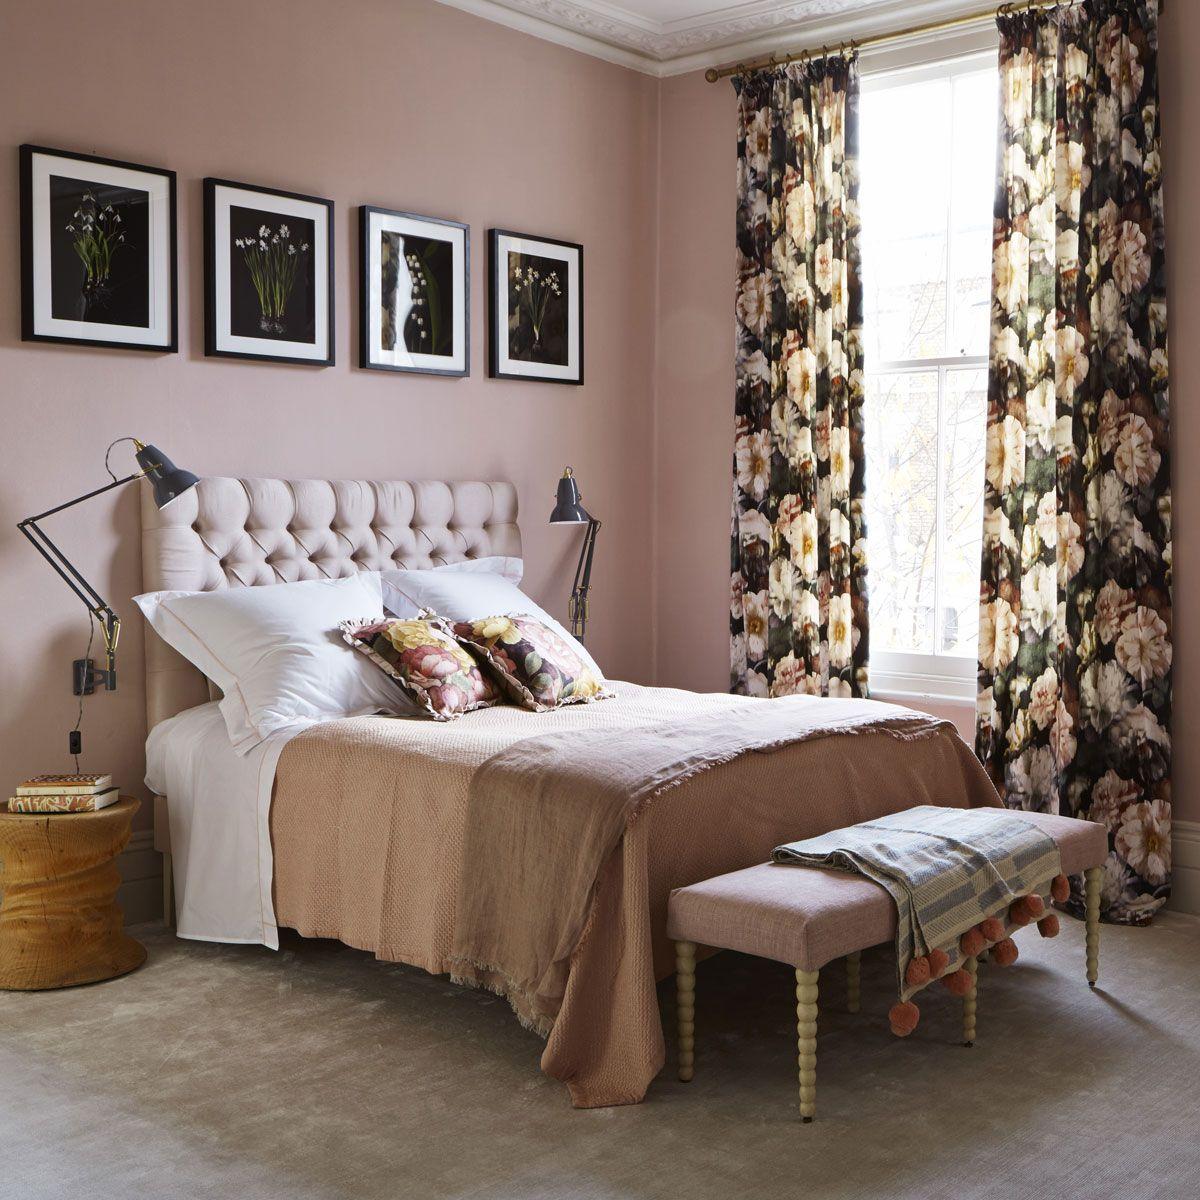 Bedroom Ideas Designs And Inspiration Pink Bedroom Walls Pink